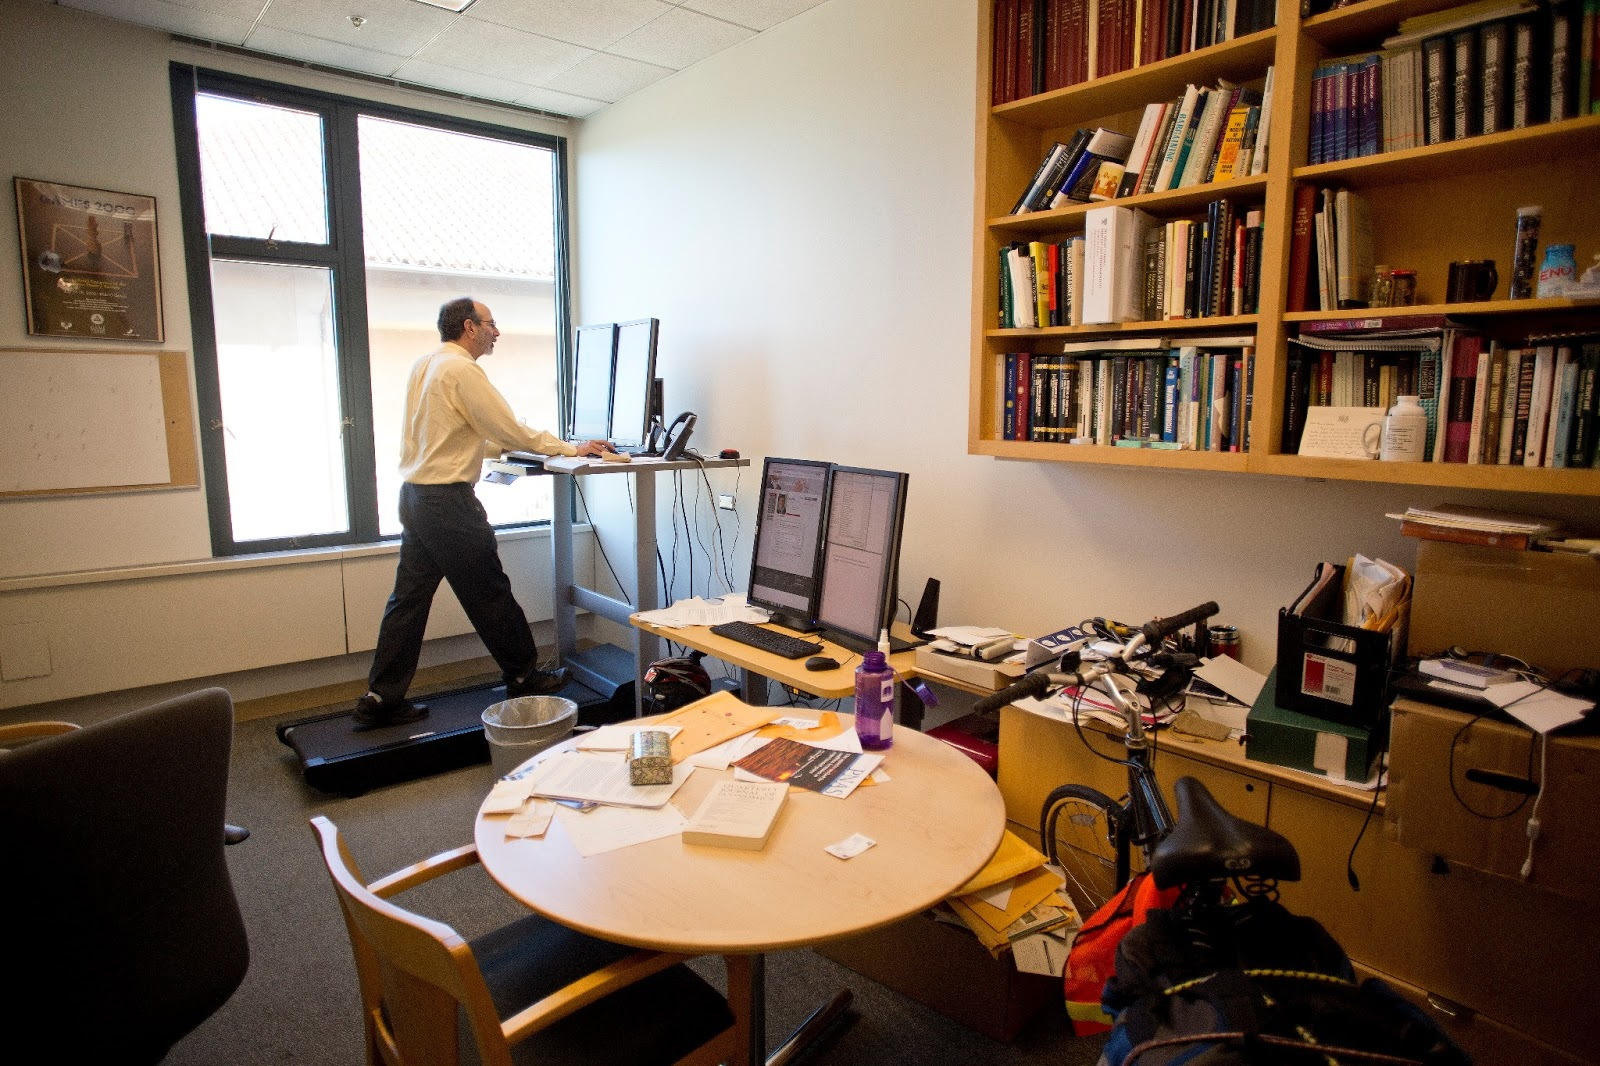 Al.treadmill desk.March 2013.Mohammad Kheirkhah photo